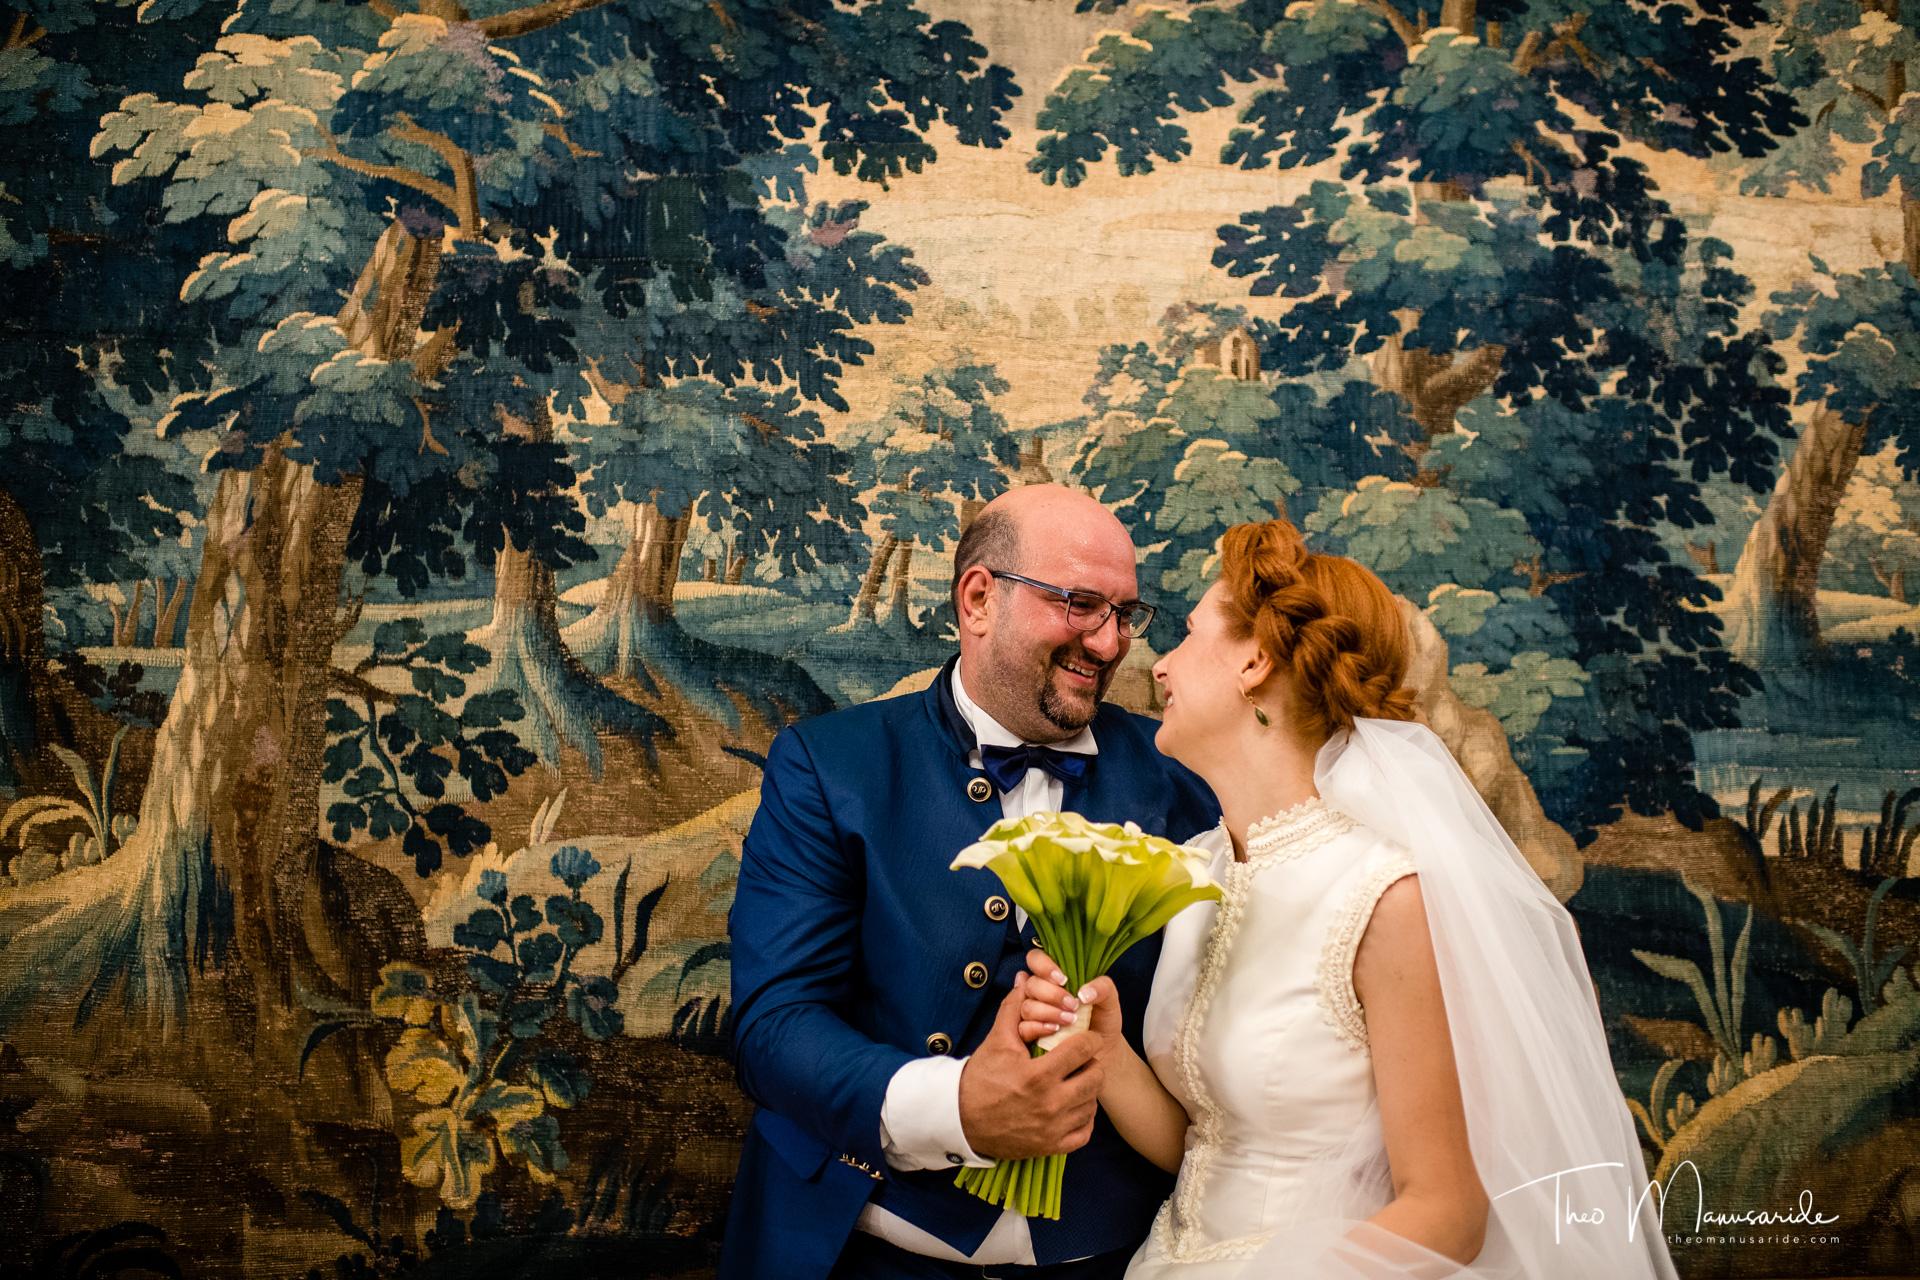 fotograf-nunta-domeniul-manasia-42